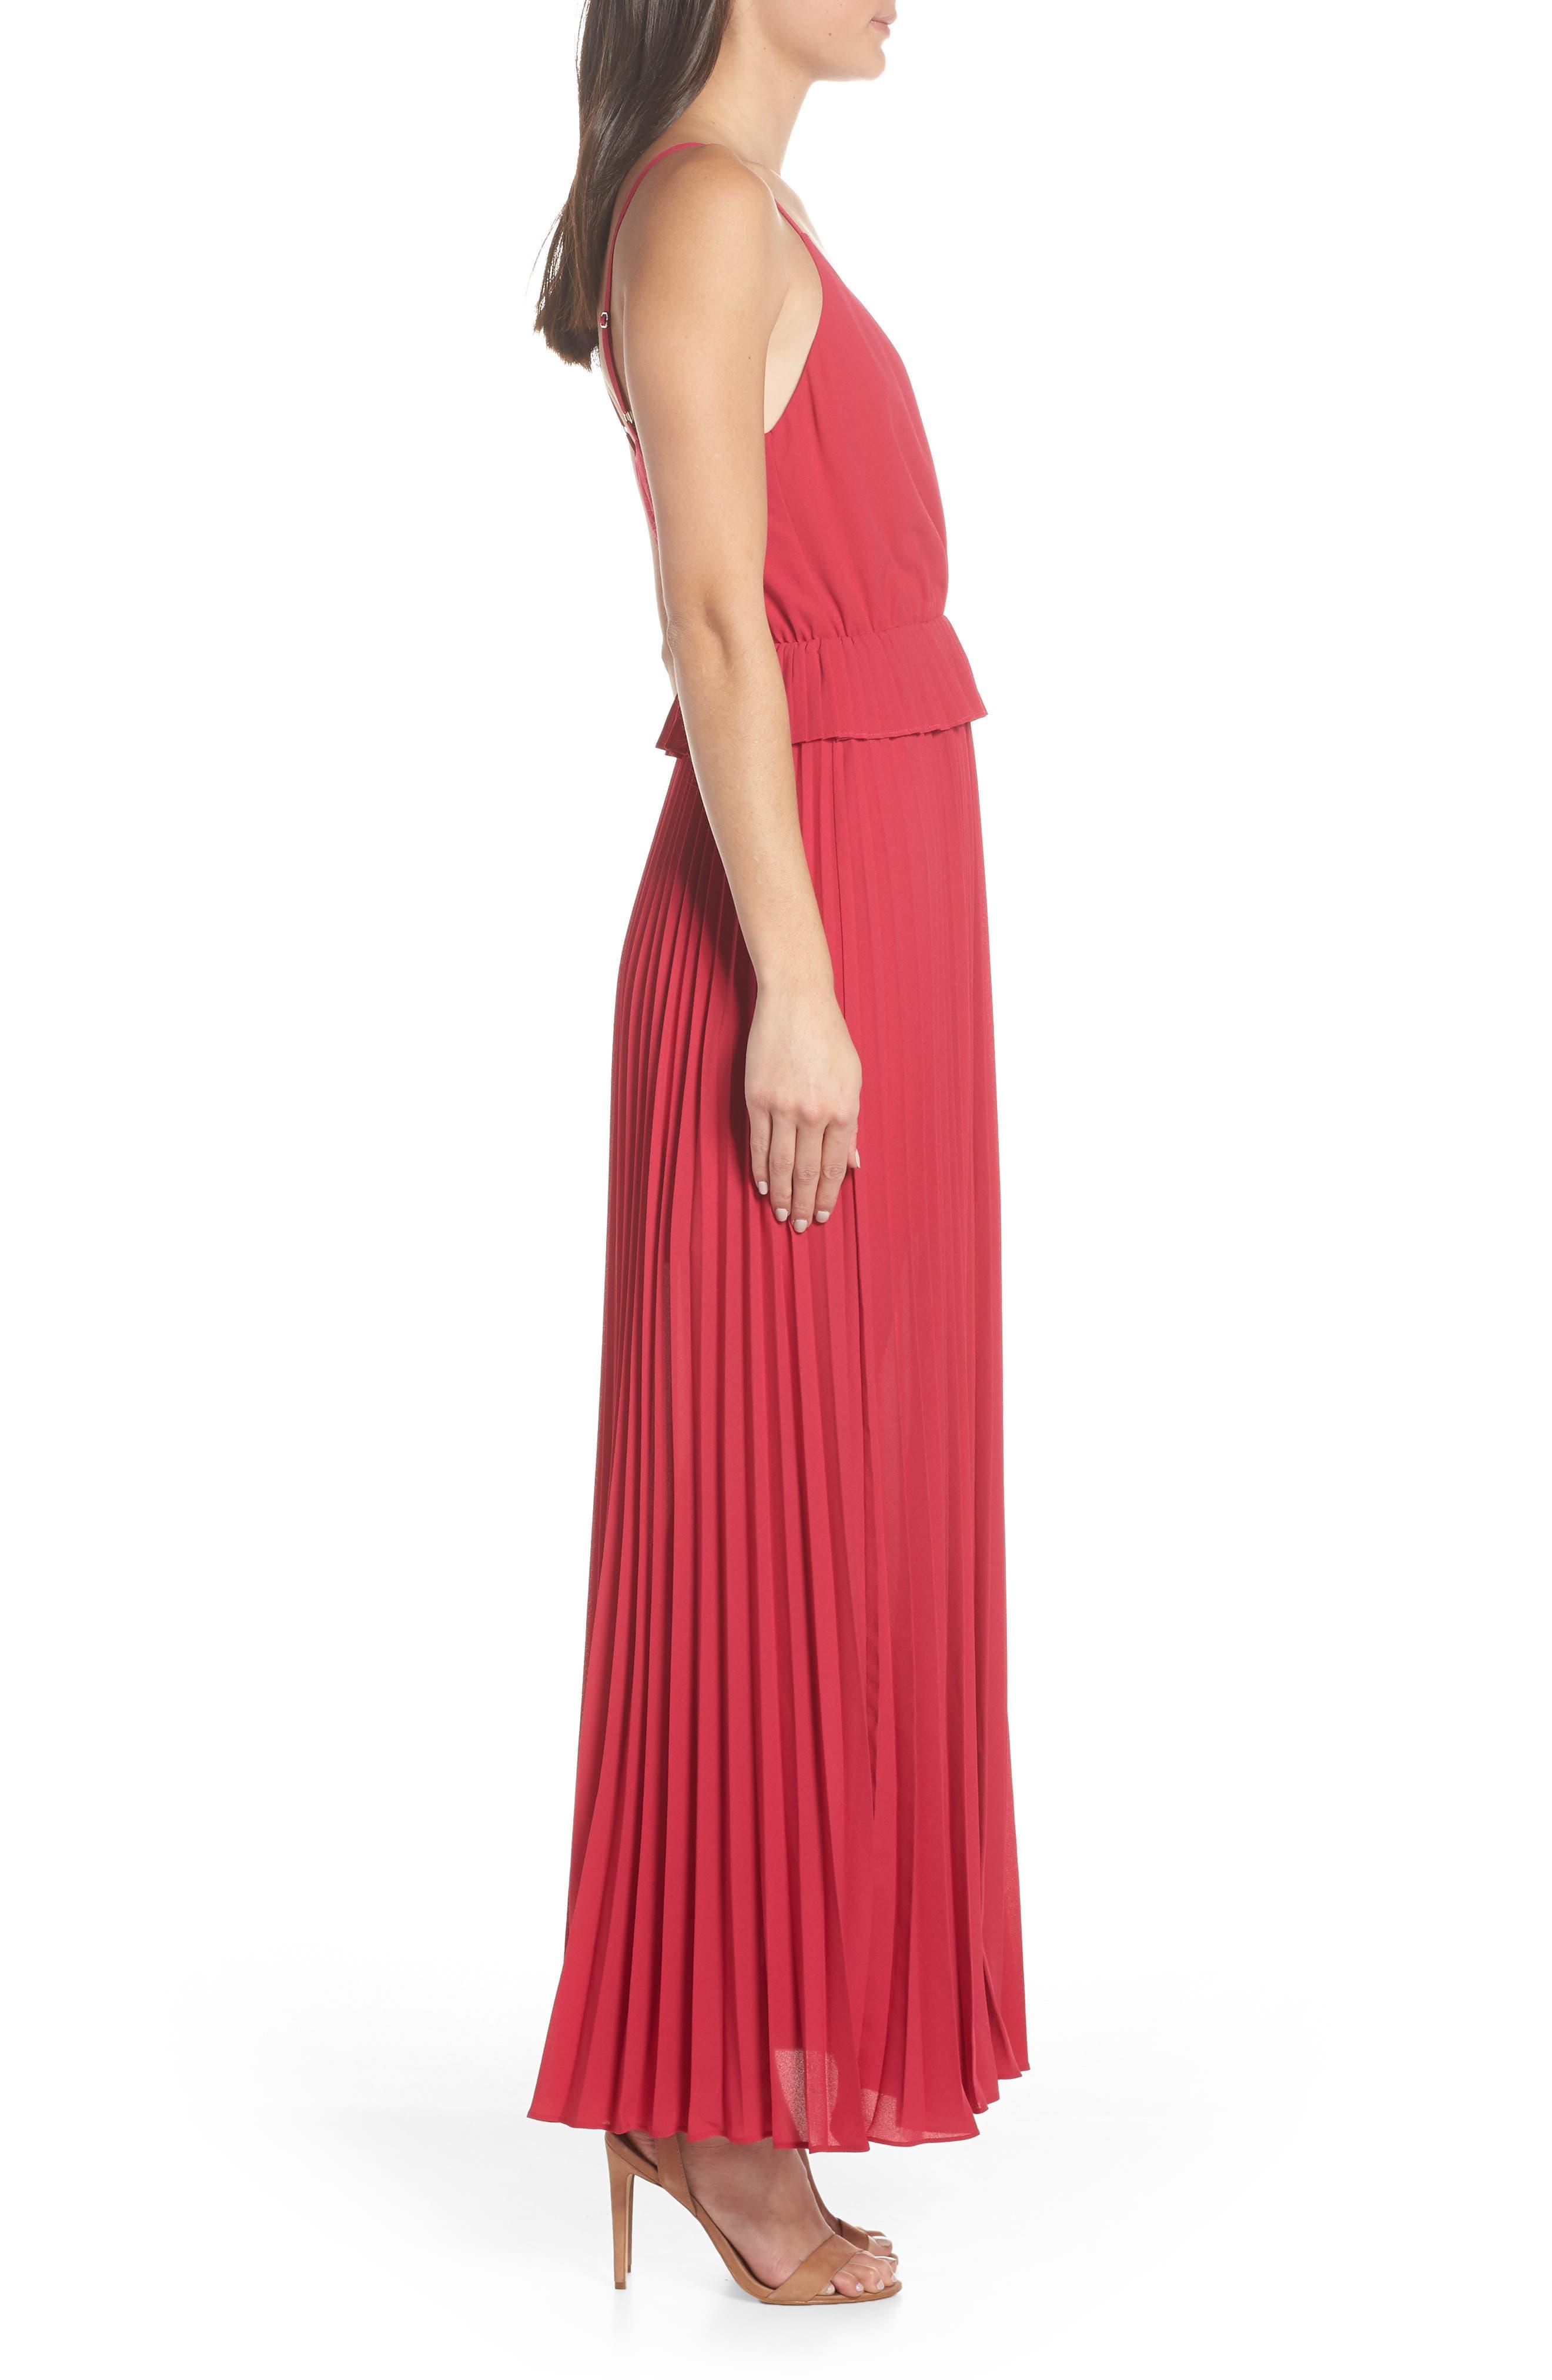 ALI & JAY, Olivet Pleated Maxi Dress, Alternate thumbnail 4, color, RASPBERRY